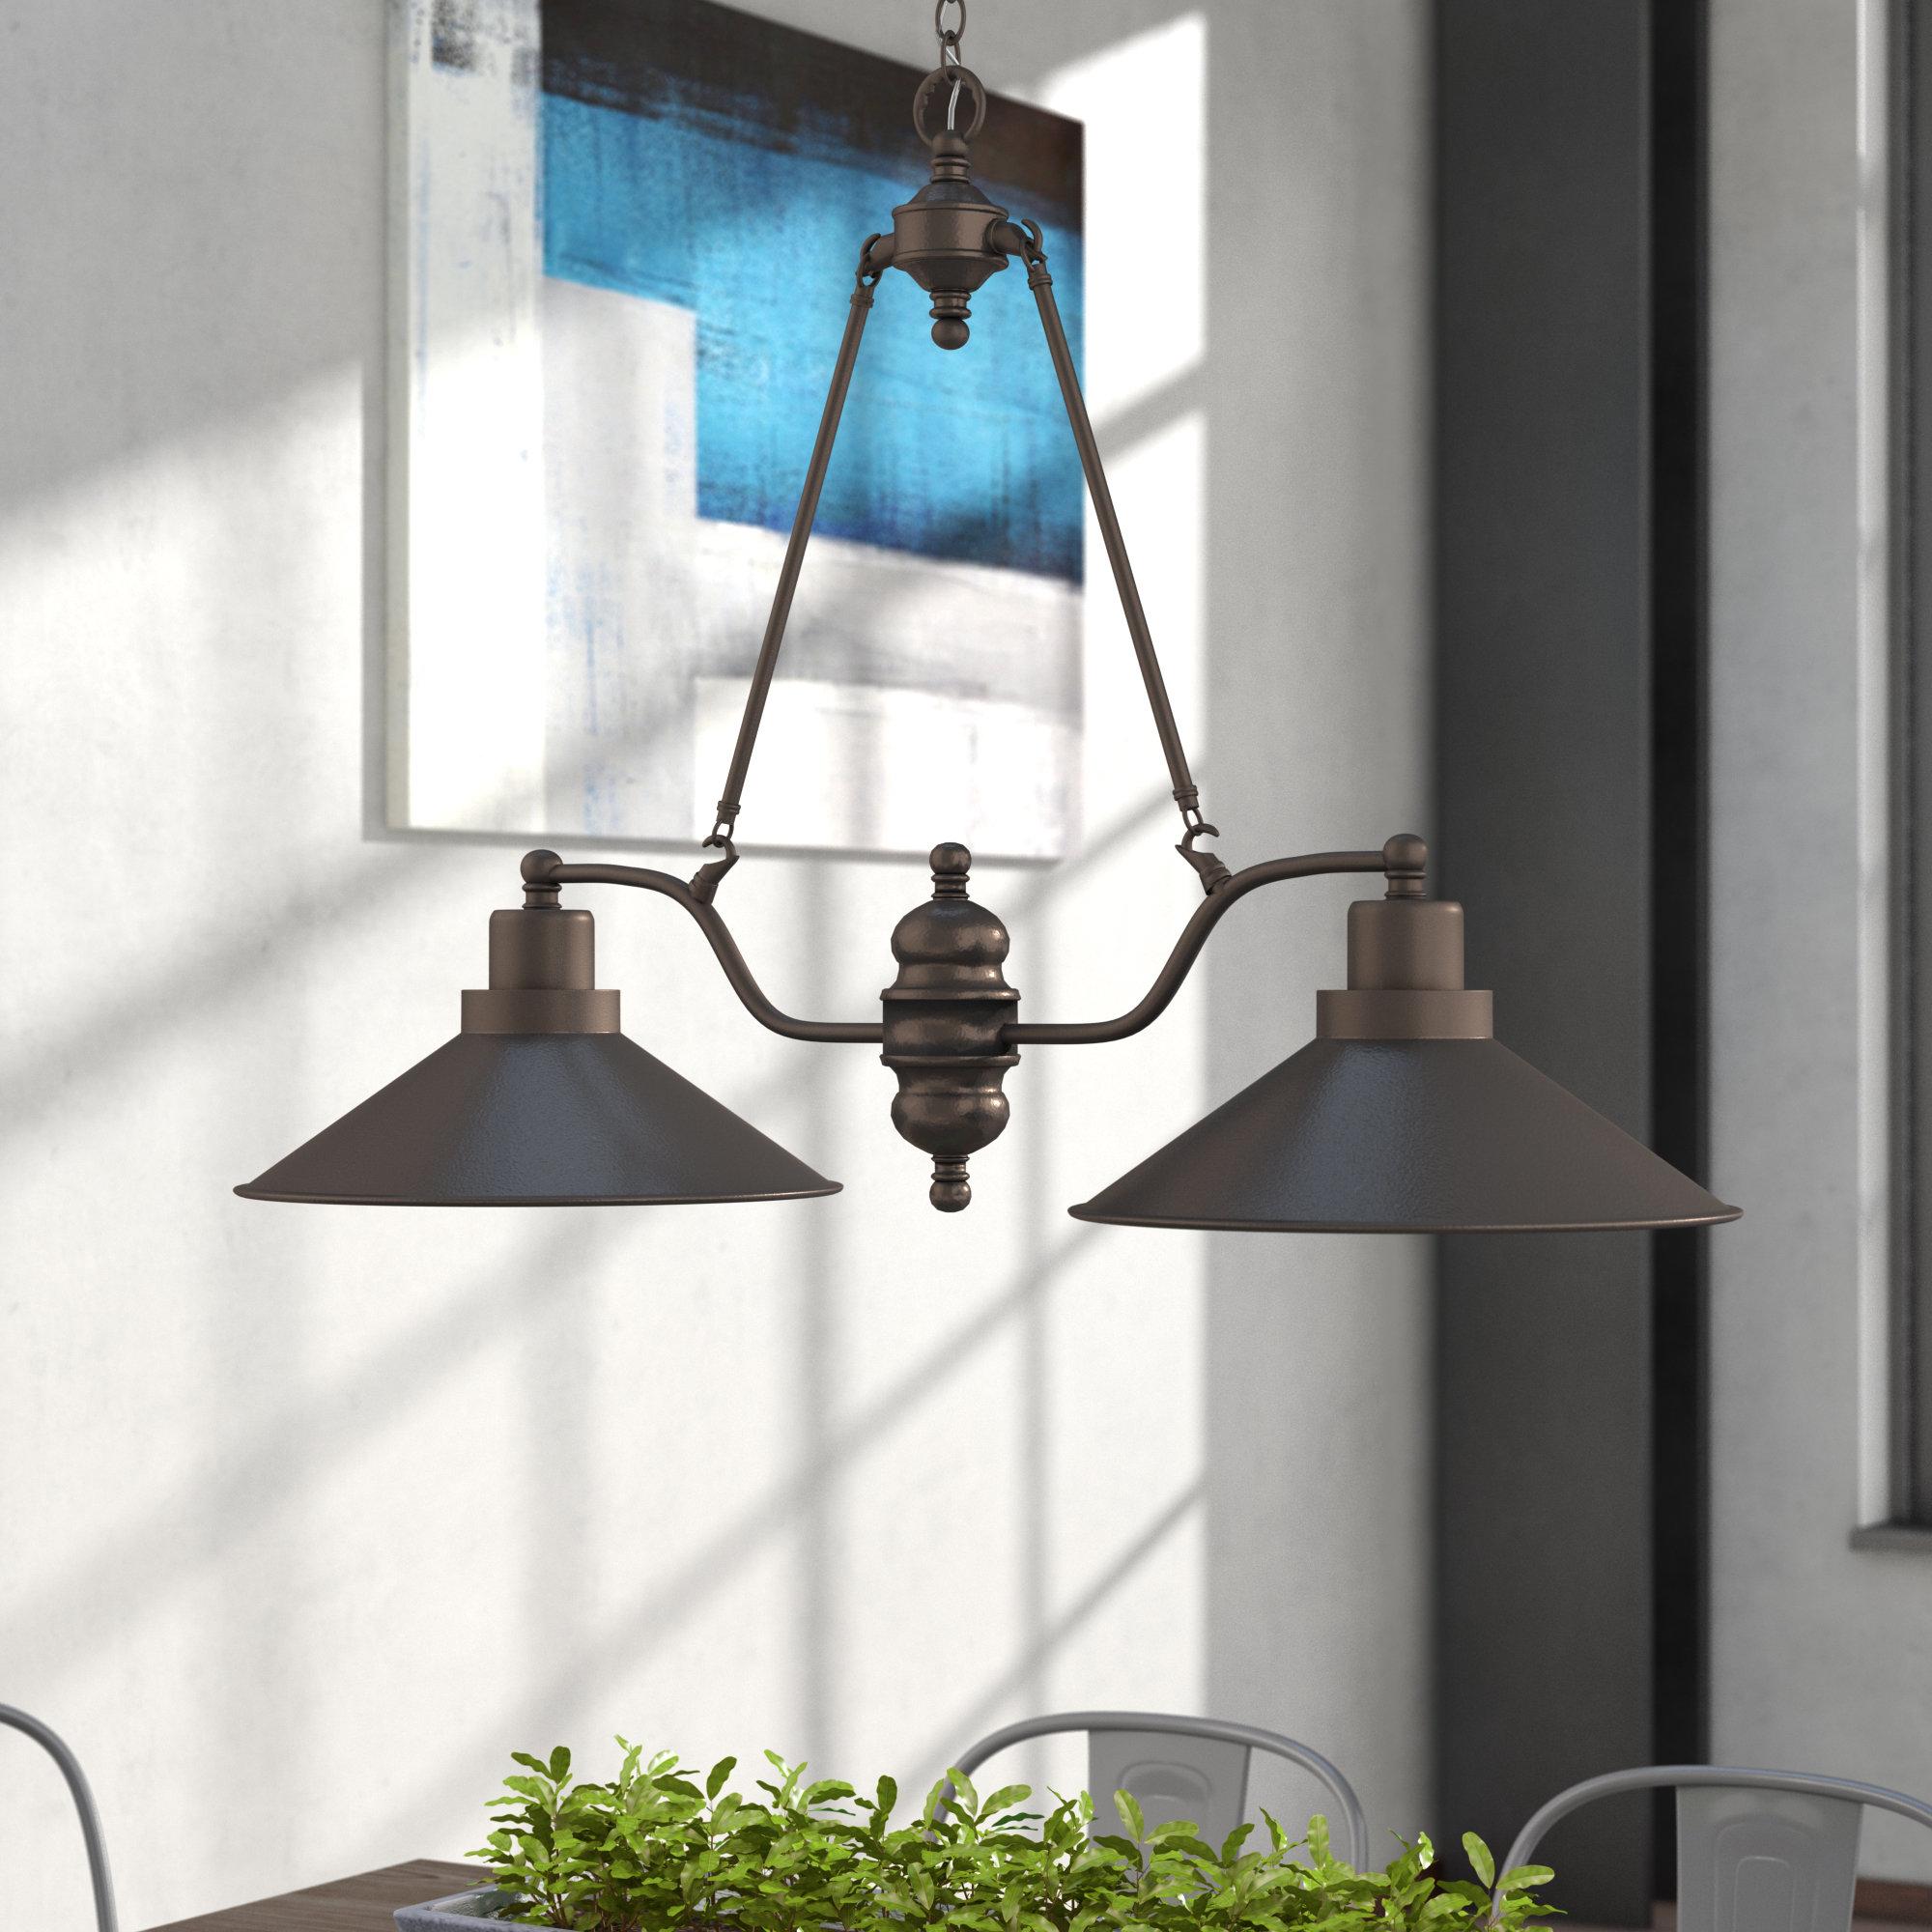 Featured Photo of Euclid 2 Light Kitchen Island Linear Pendants